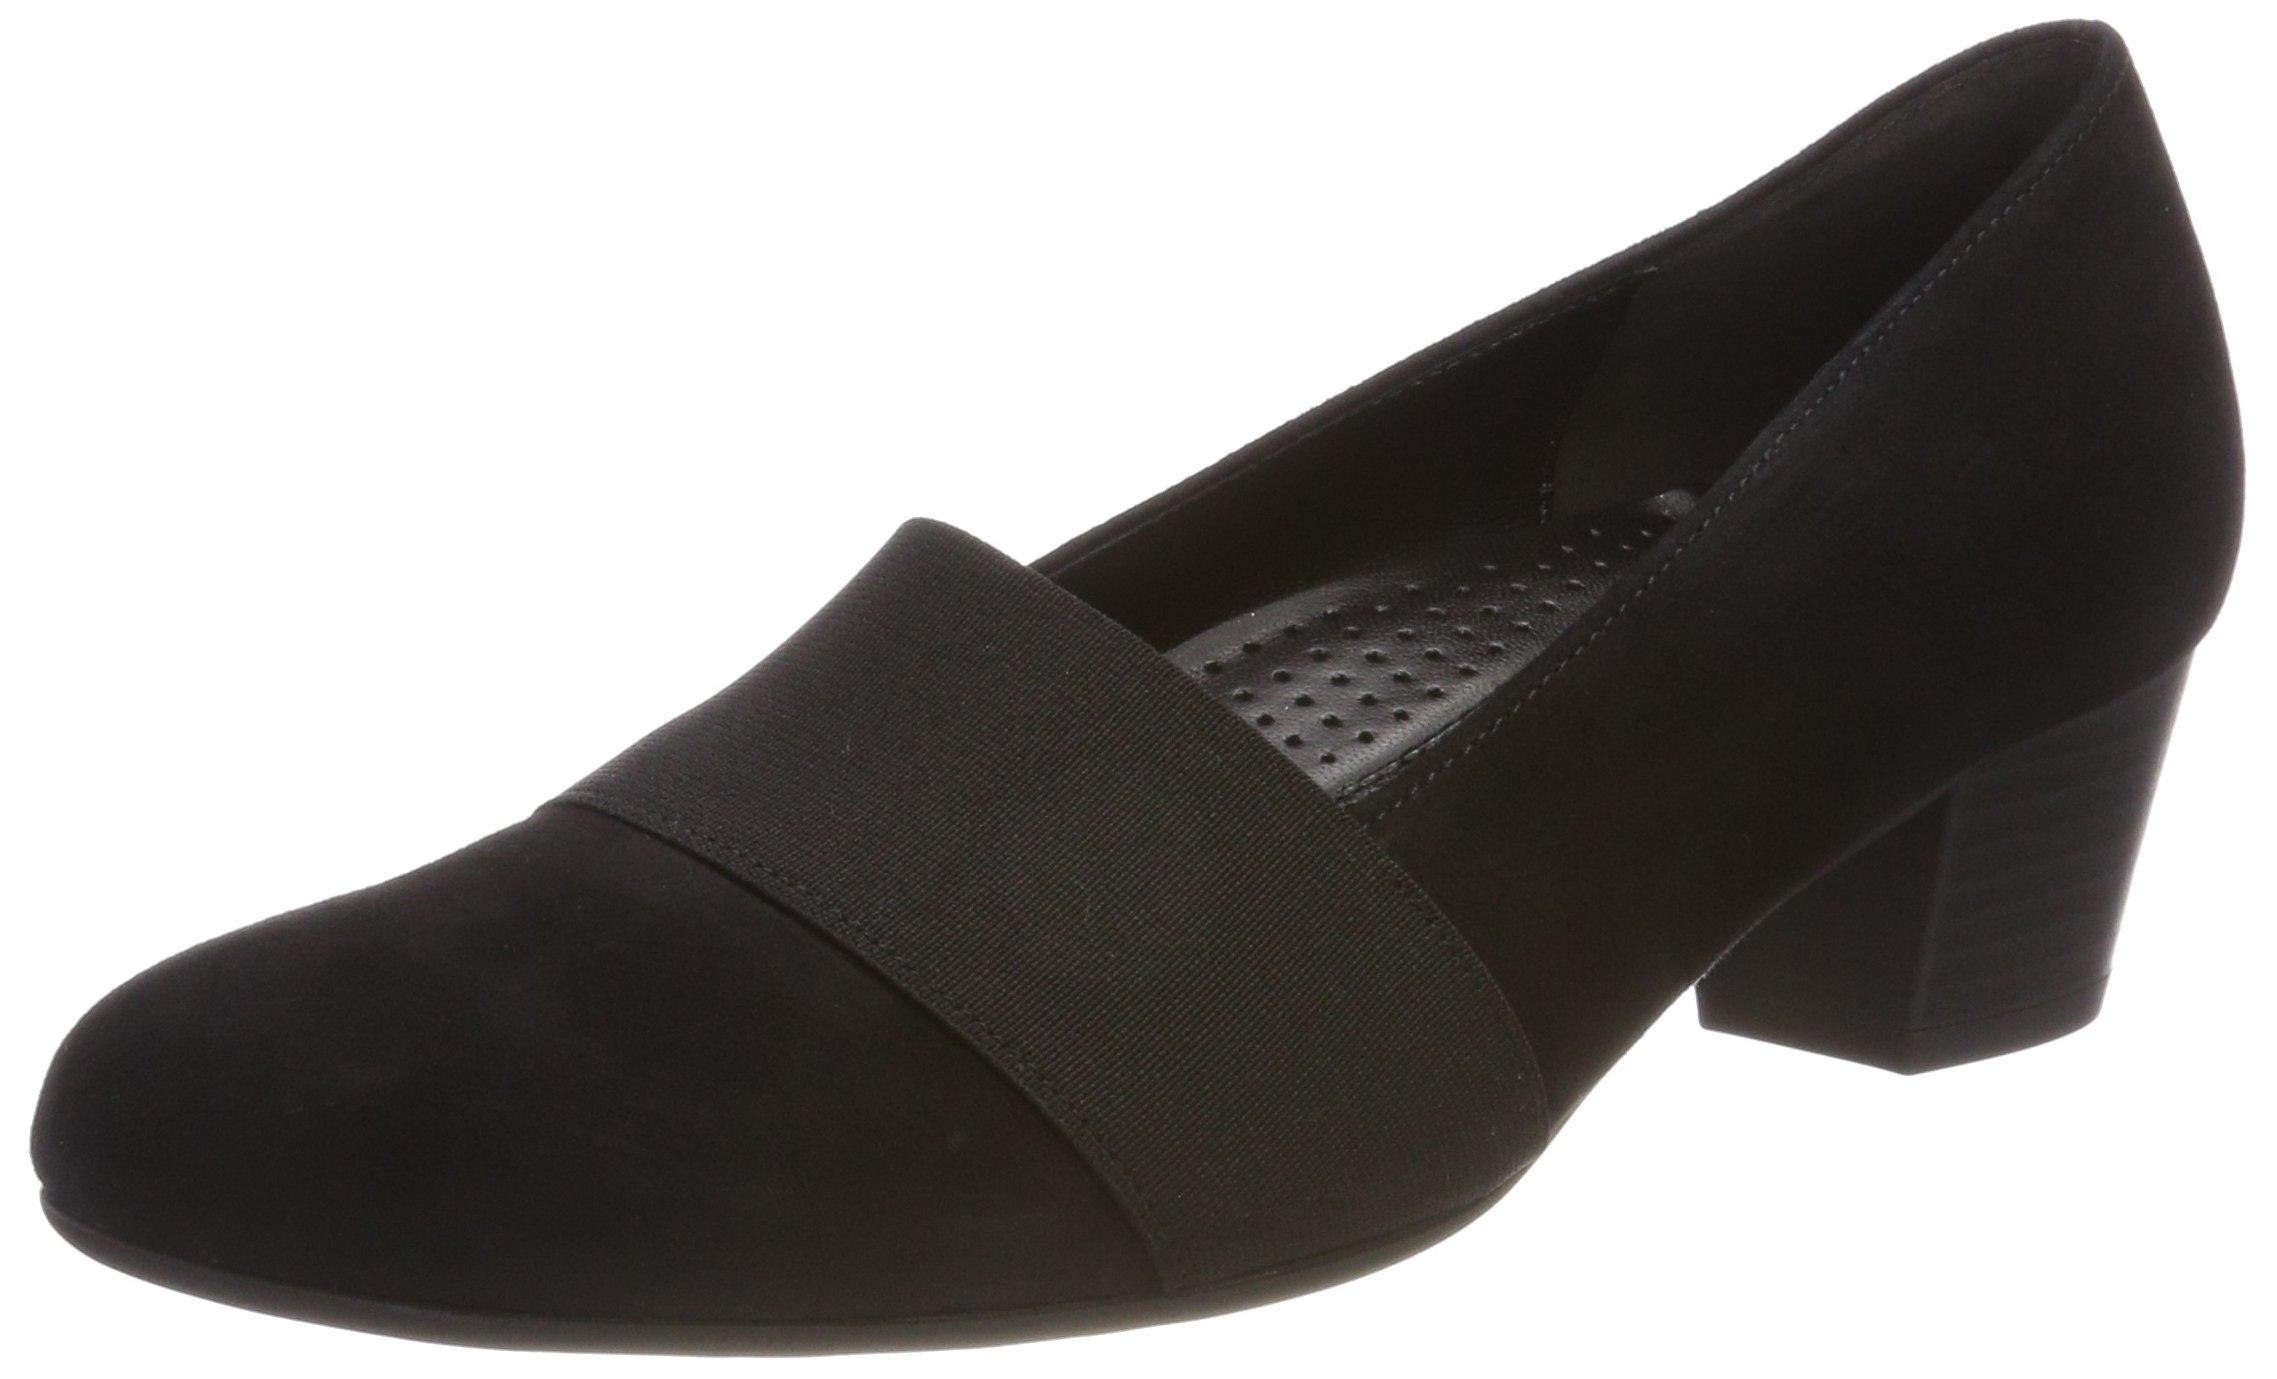 Comfort Schwarz39 FemmeNoir Eu FashionEscarpins Shoes Gabor 3ARqjL54